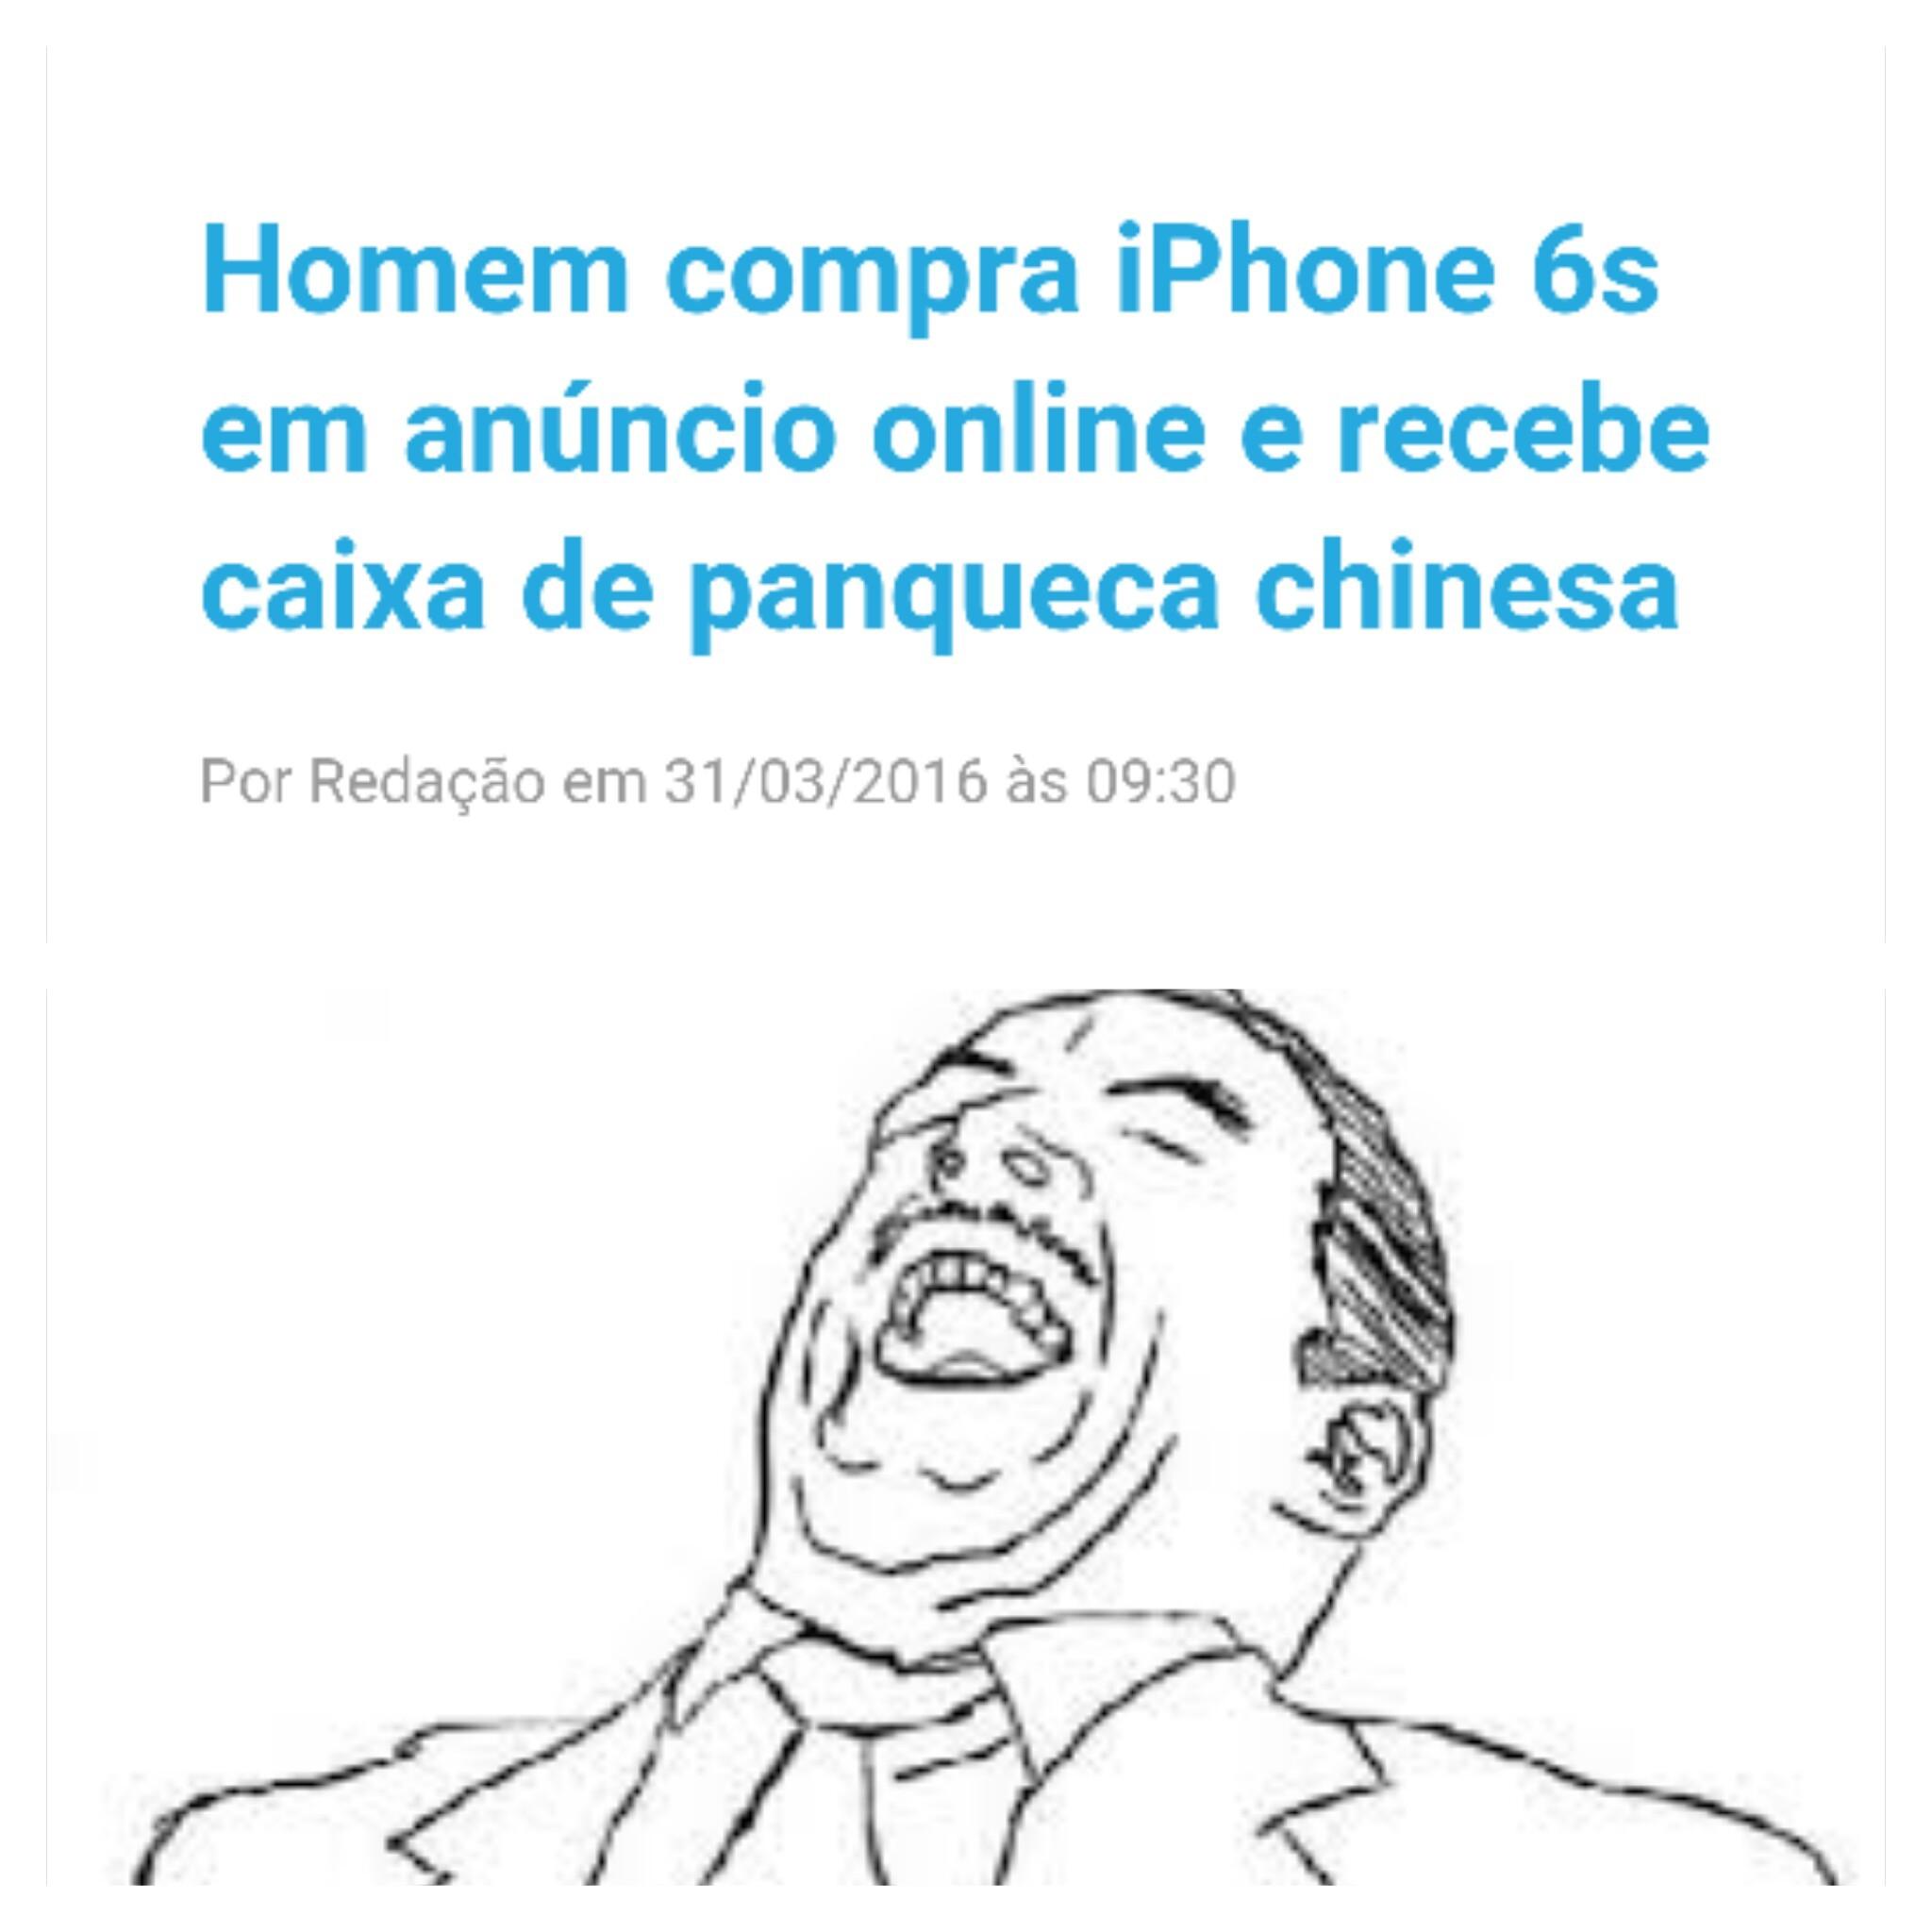 Panquecas!!! - meme